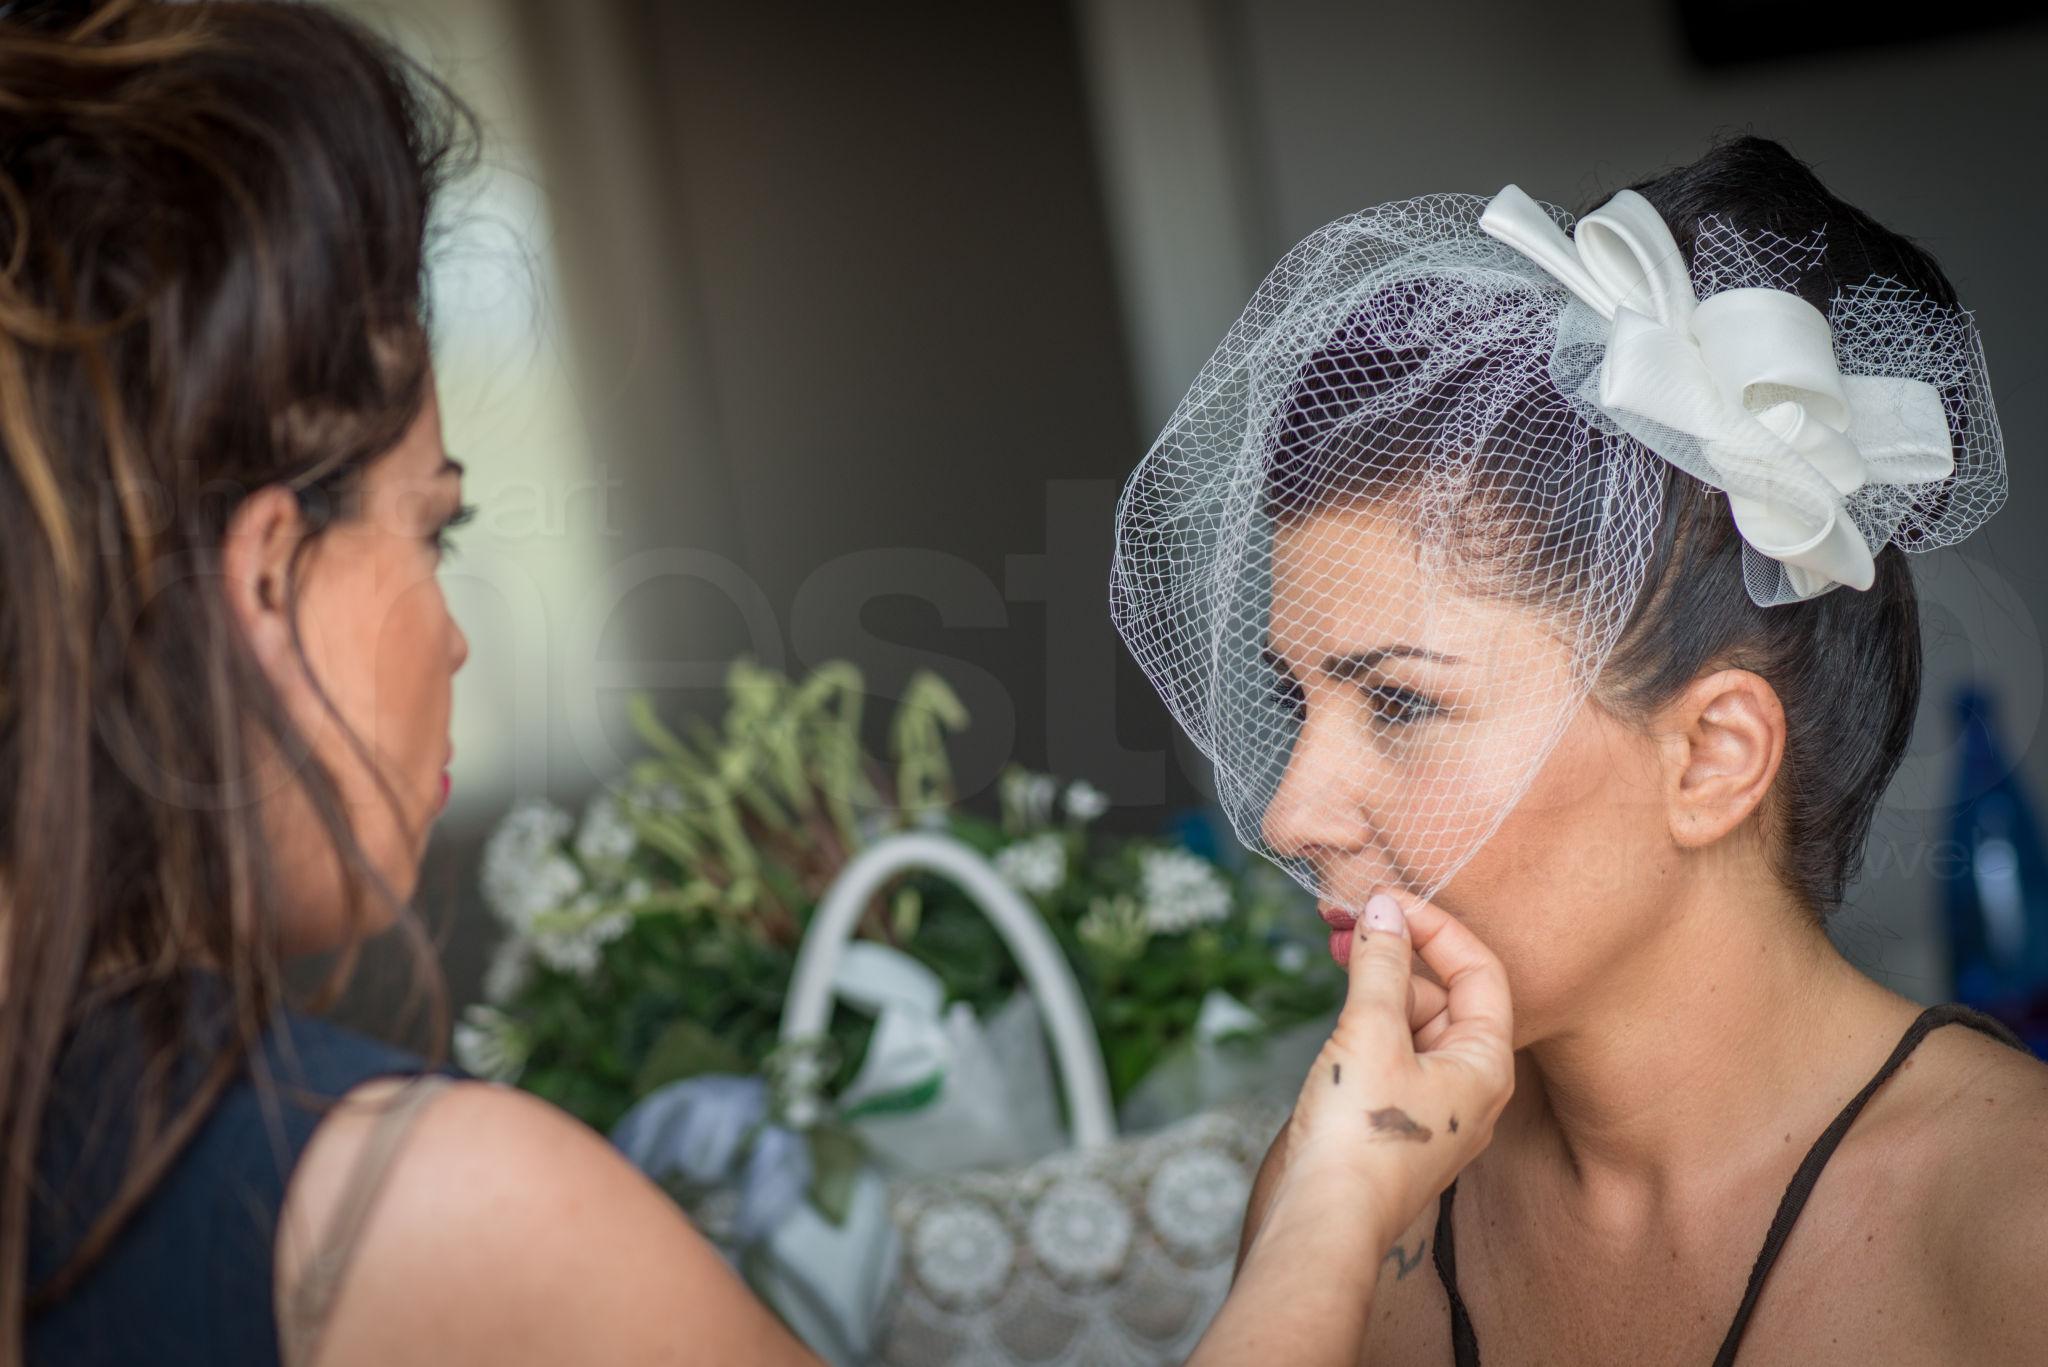 http://lnx.mirkone.it/wp-content/uploads/2015/07/fotografo-matrimoni-faenza-0002.jpg